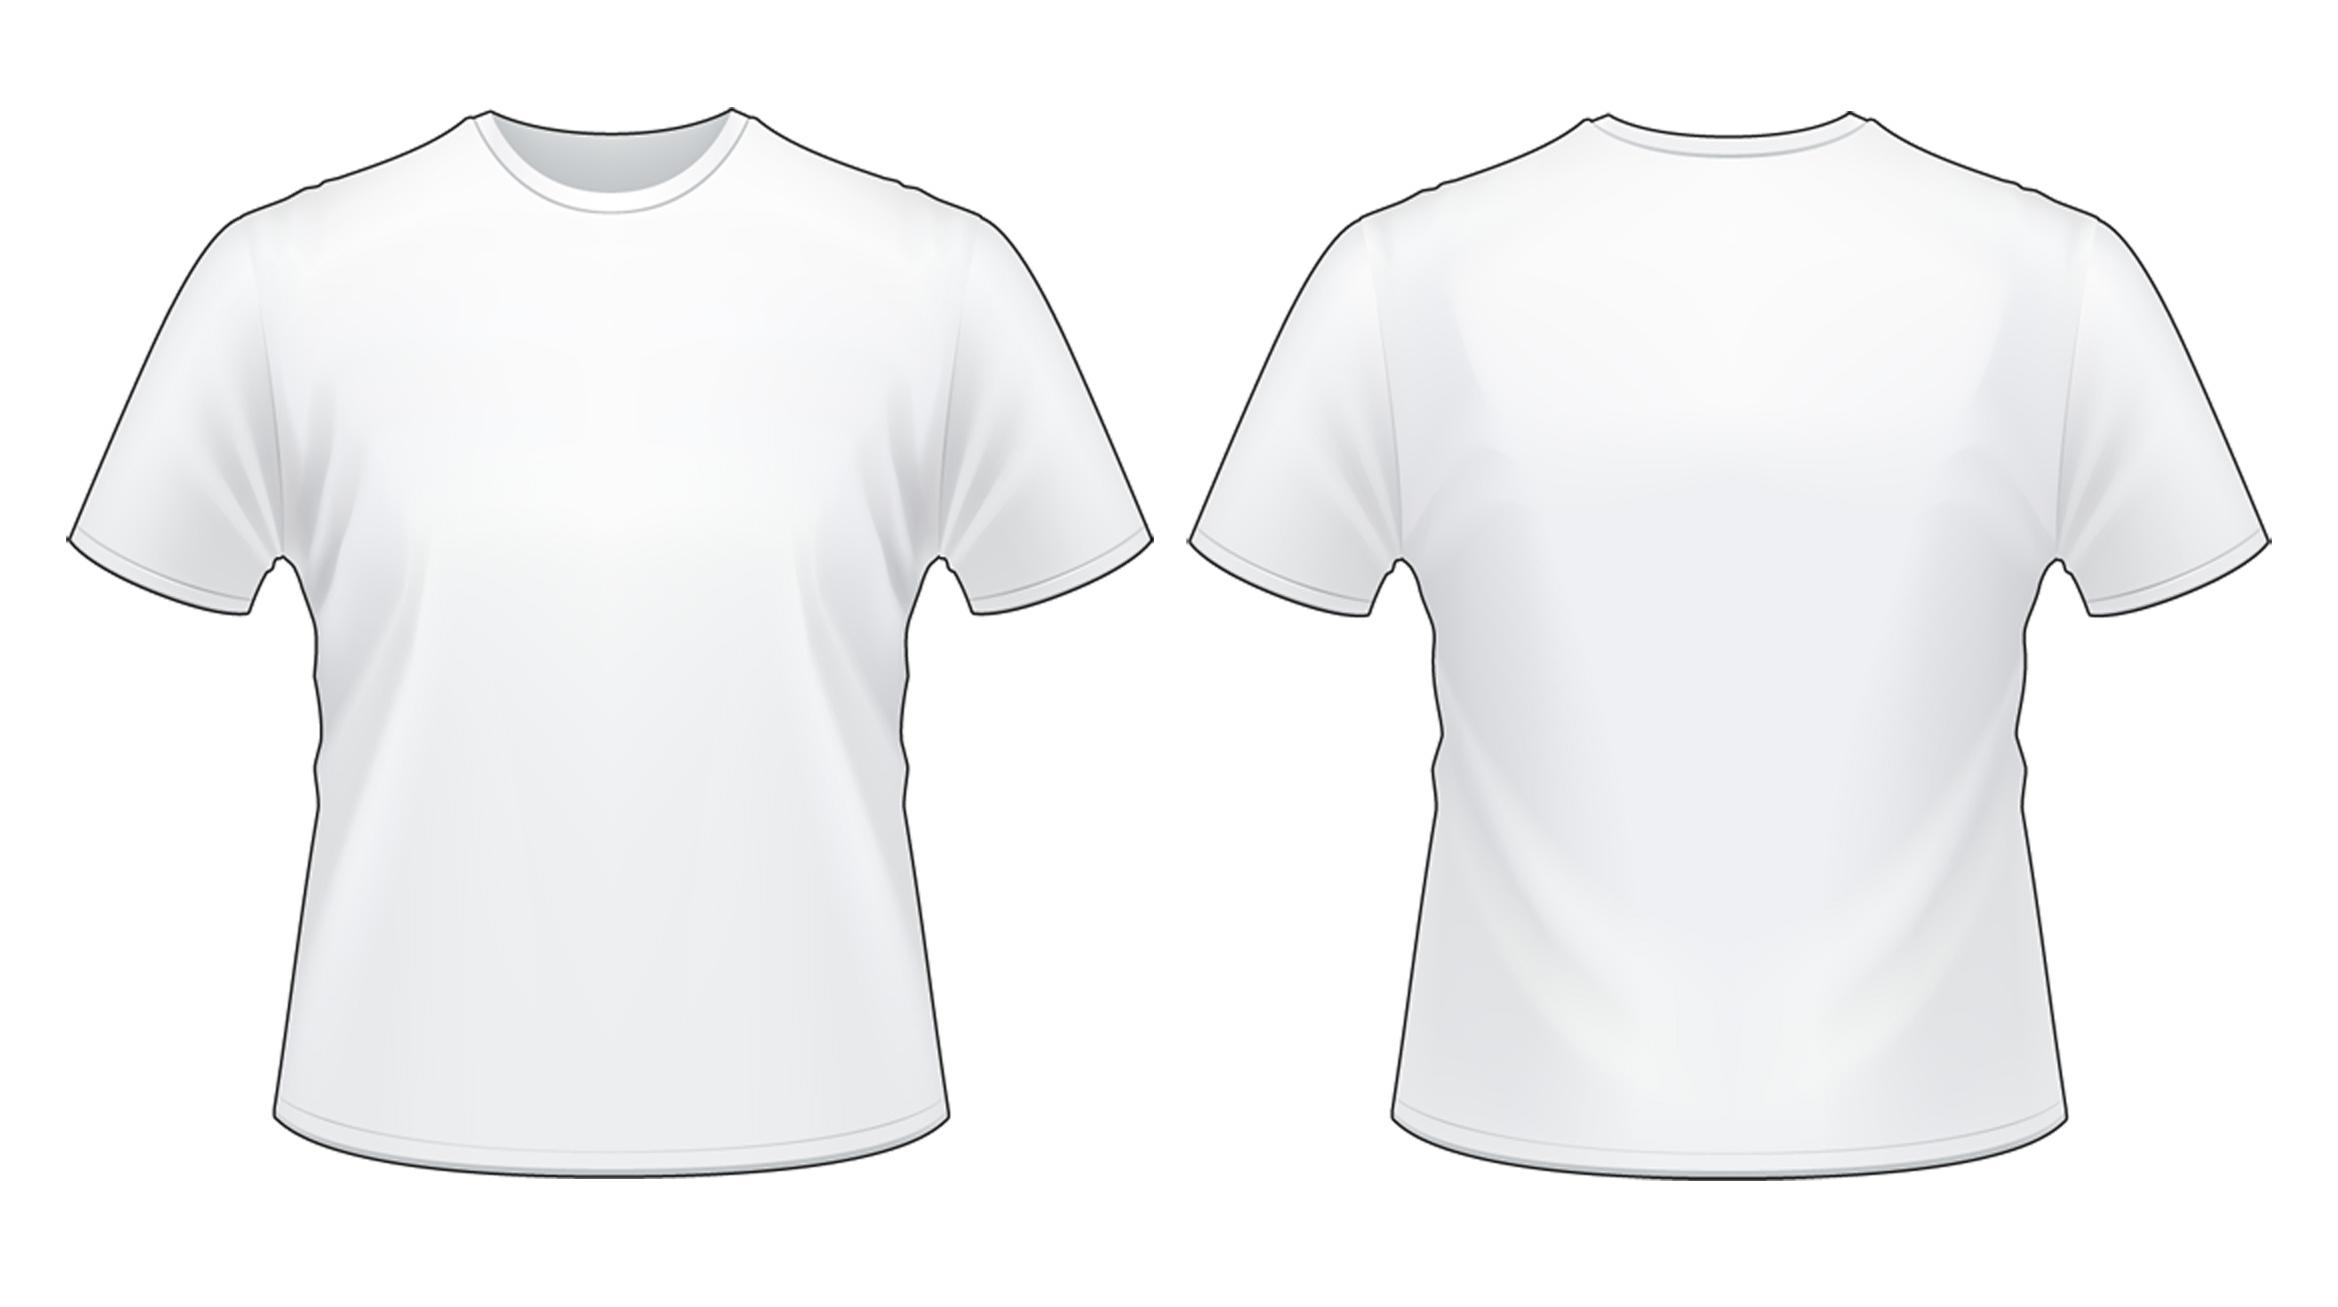 Why Make Your Own T Shirt Design Careyfashion